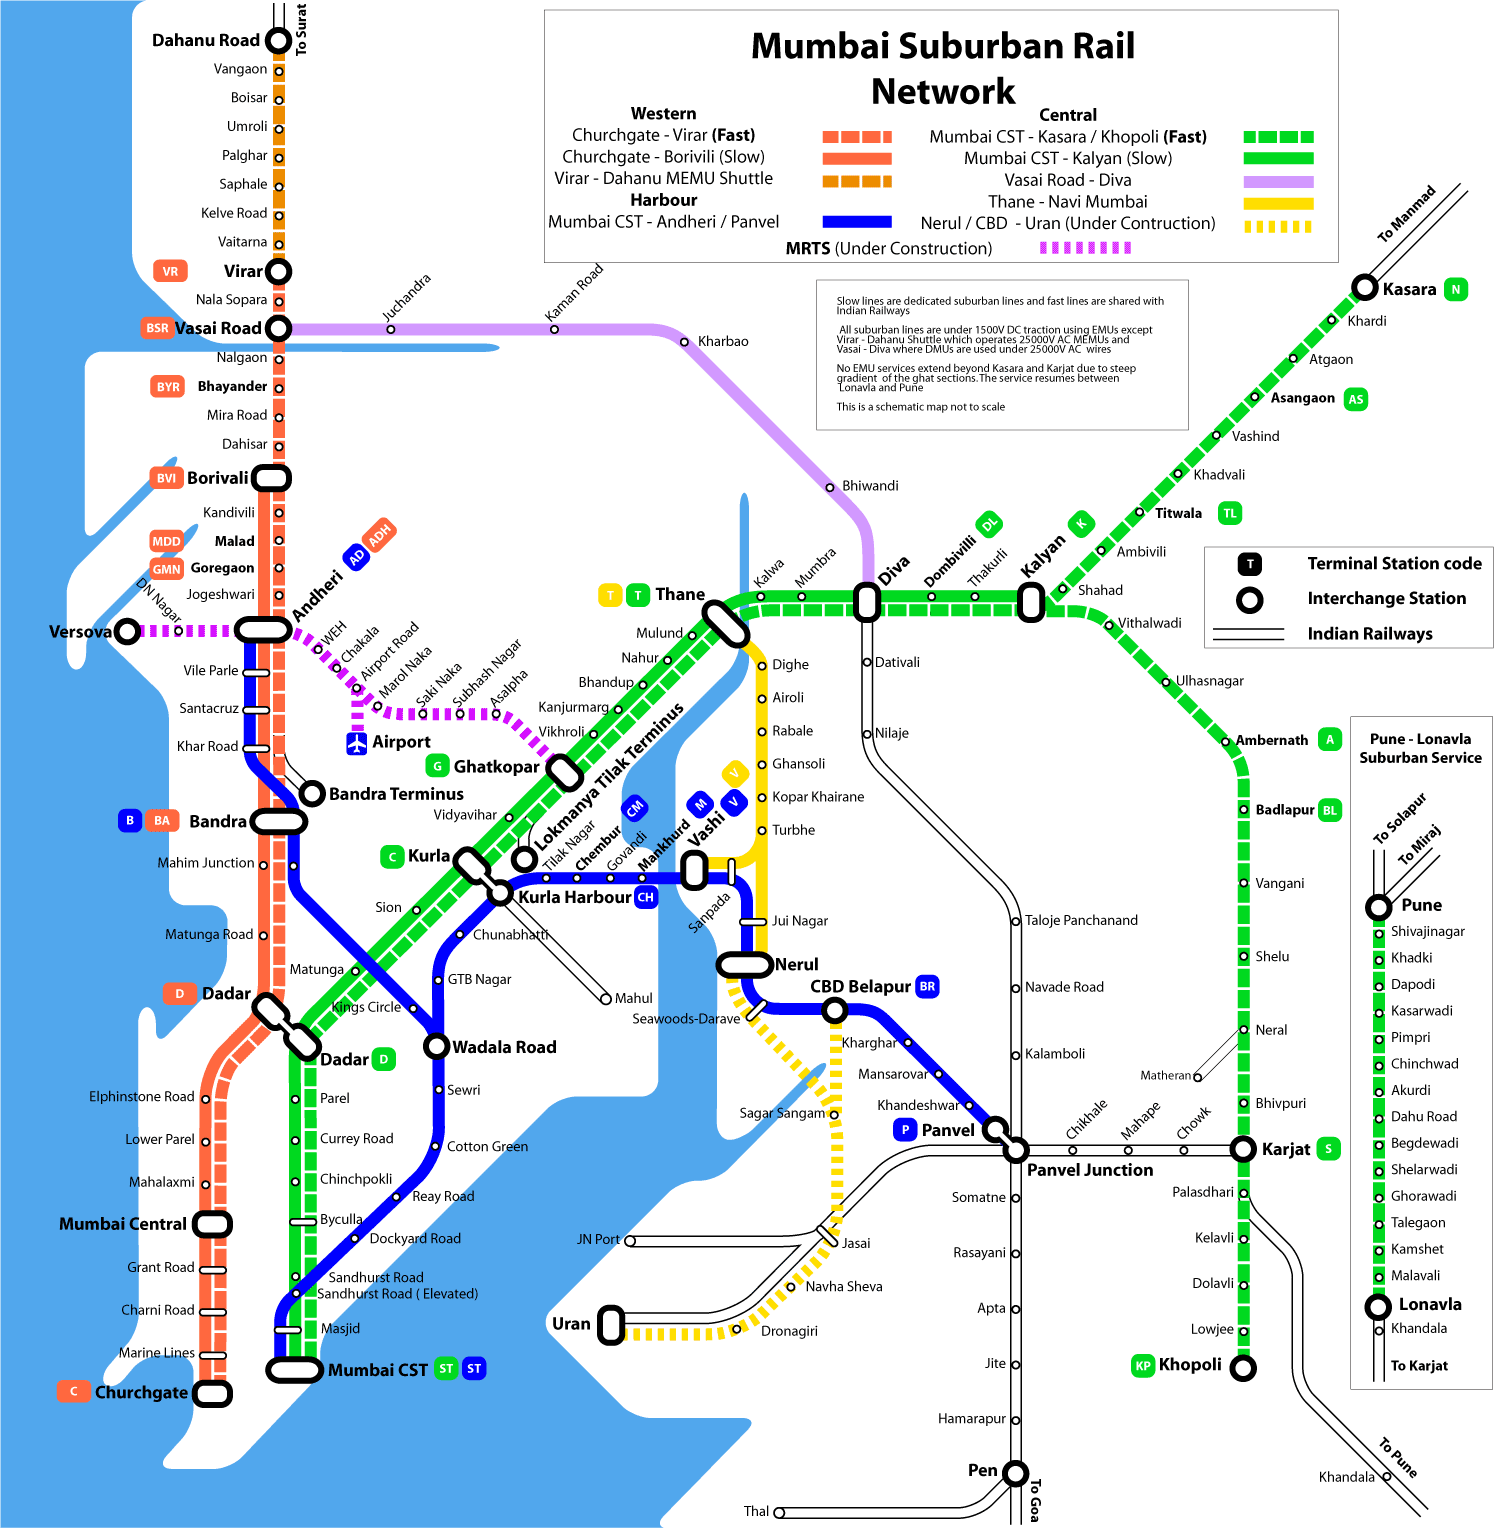 Railway Map Mumbai Image   Mumbai suburban rail map.png | Mumbai Wiki | FANDOM  Railway Map Mumbai